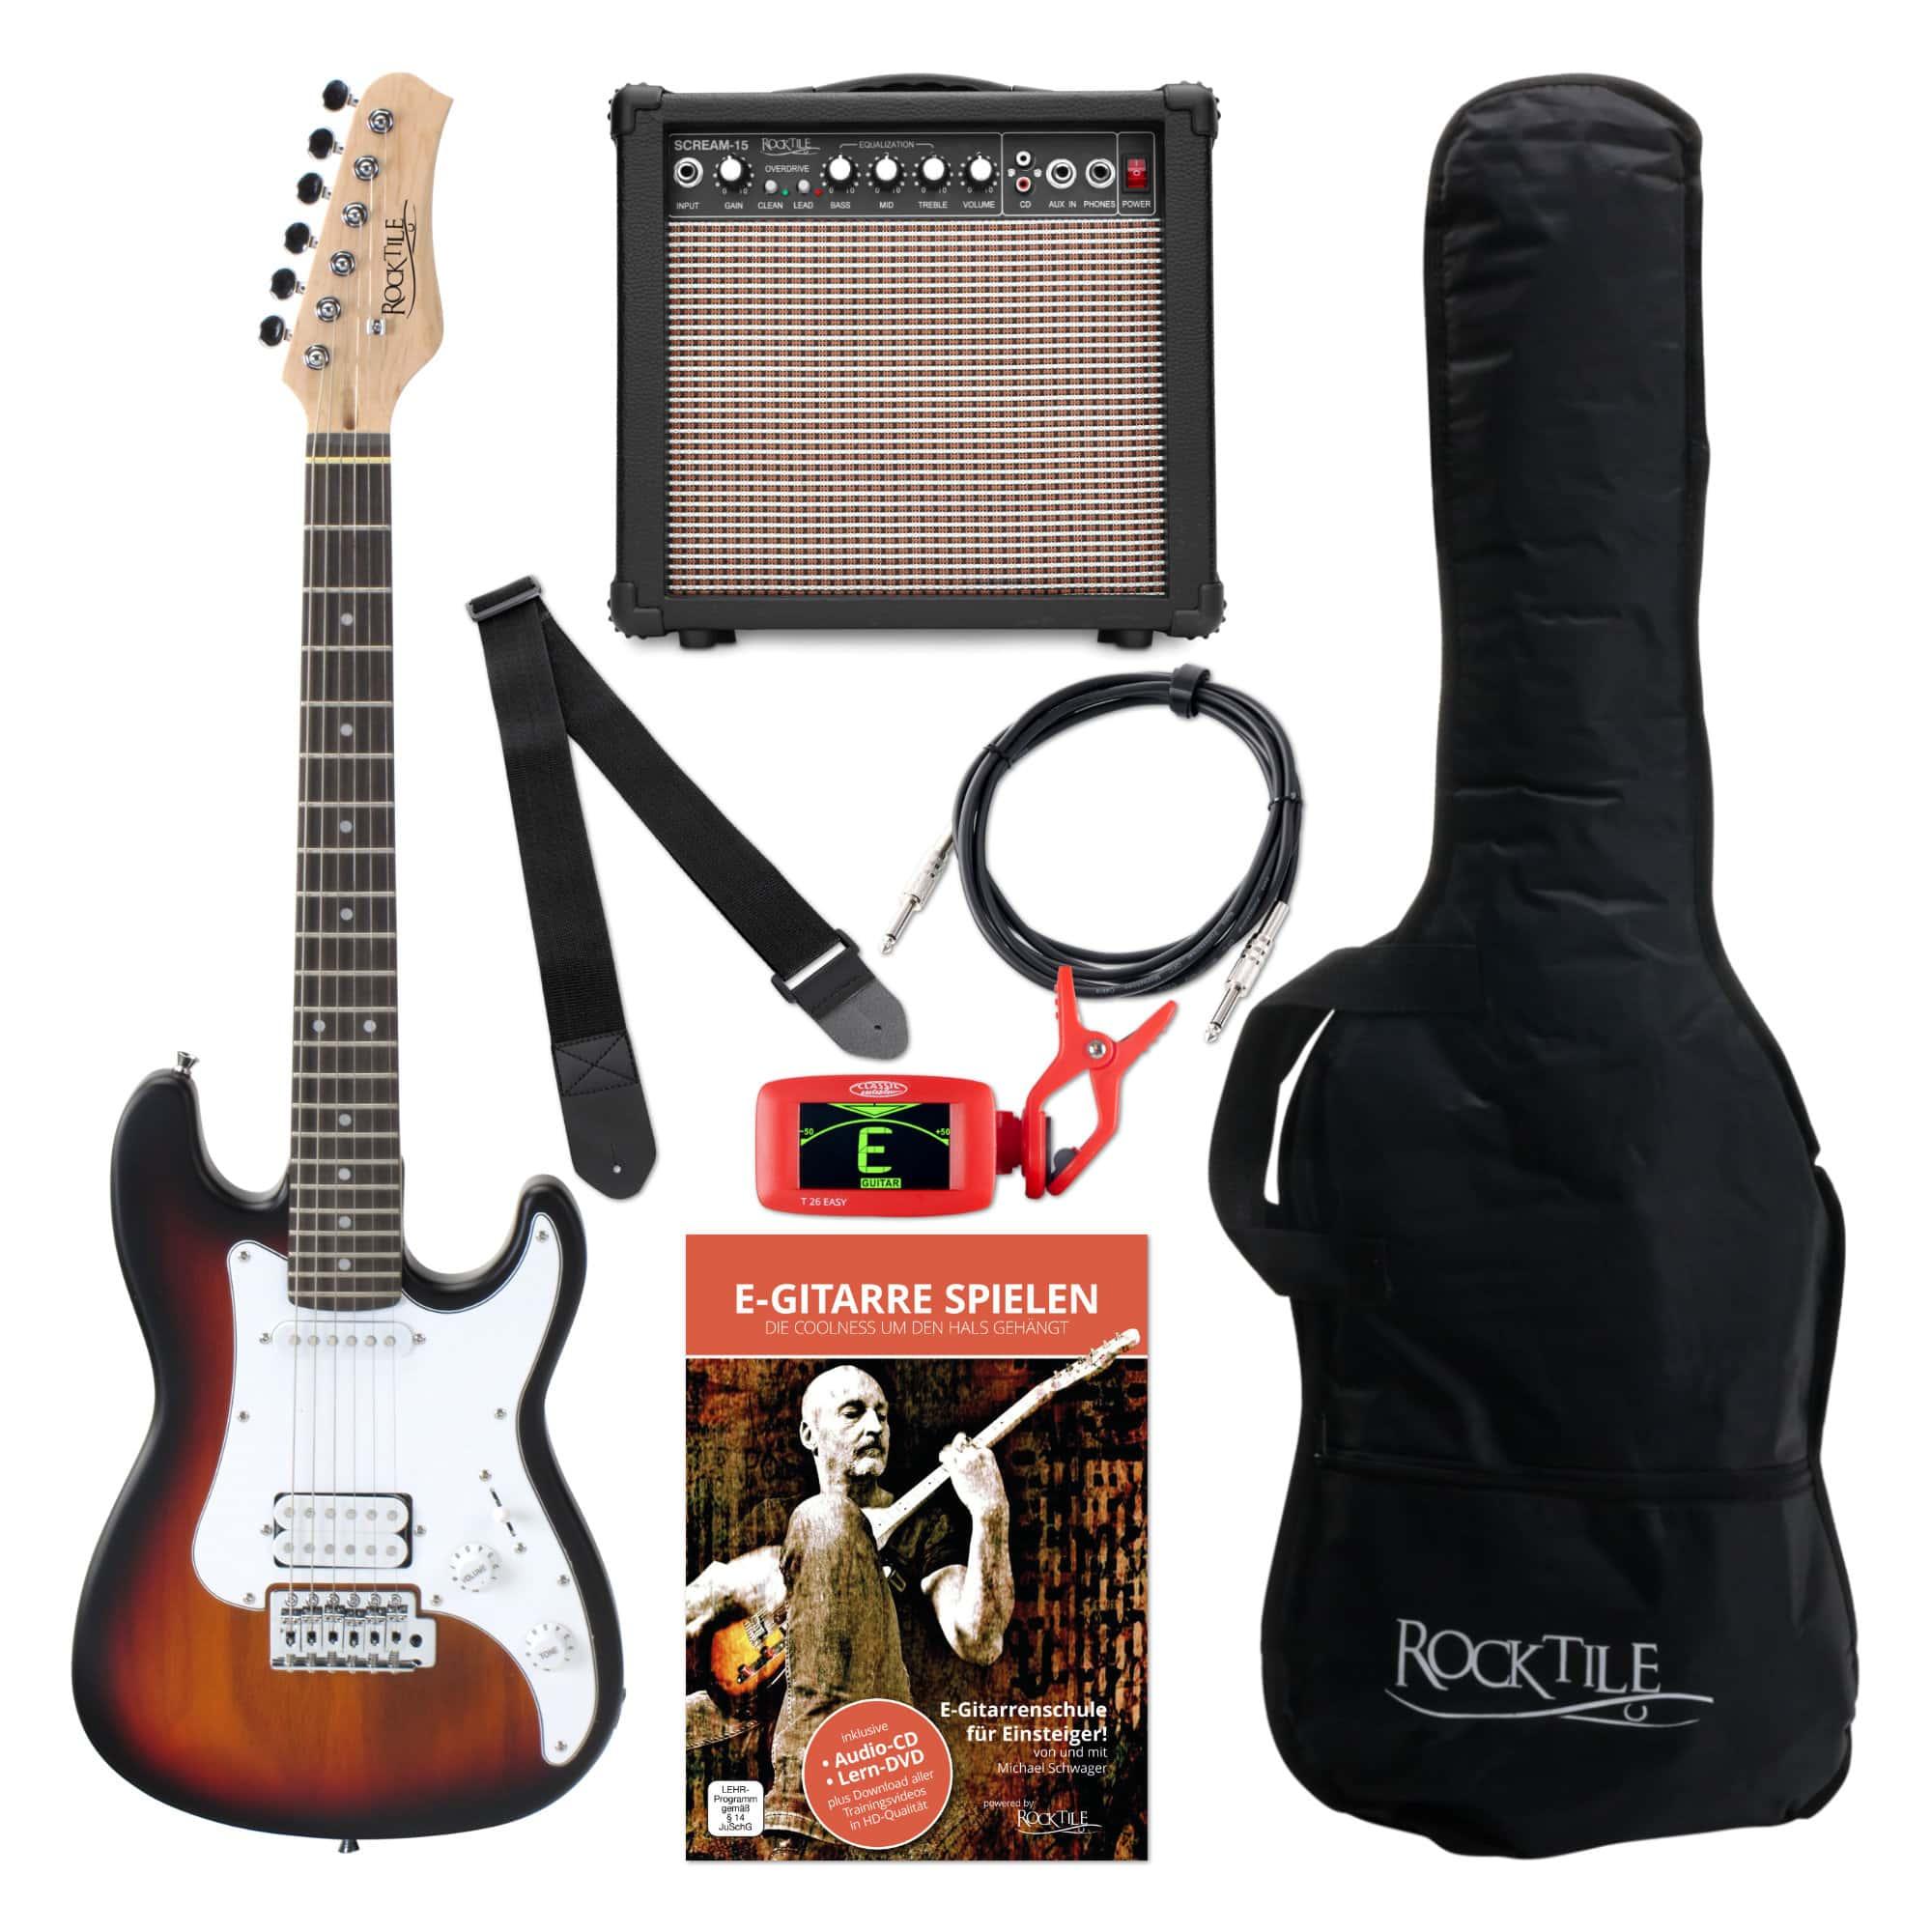 Rocktile Sphere Junior E Gitarre 3|4 Sunburst SET inkl. Verstärker, Kabel und Gurt